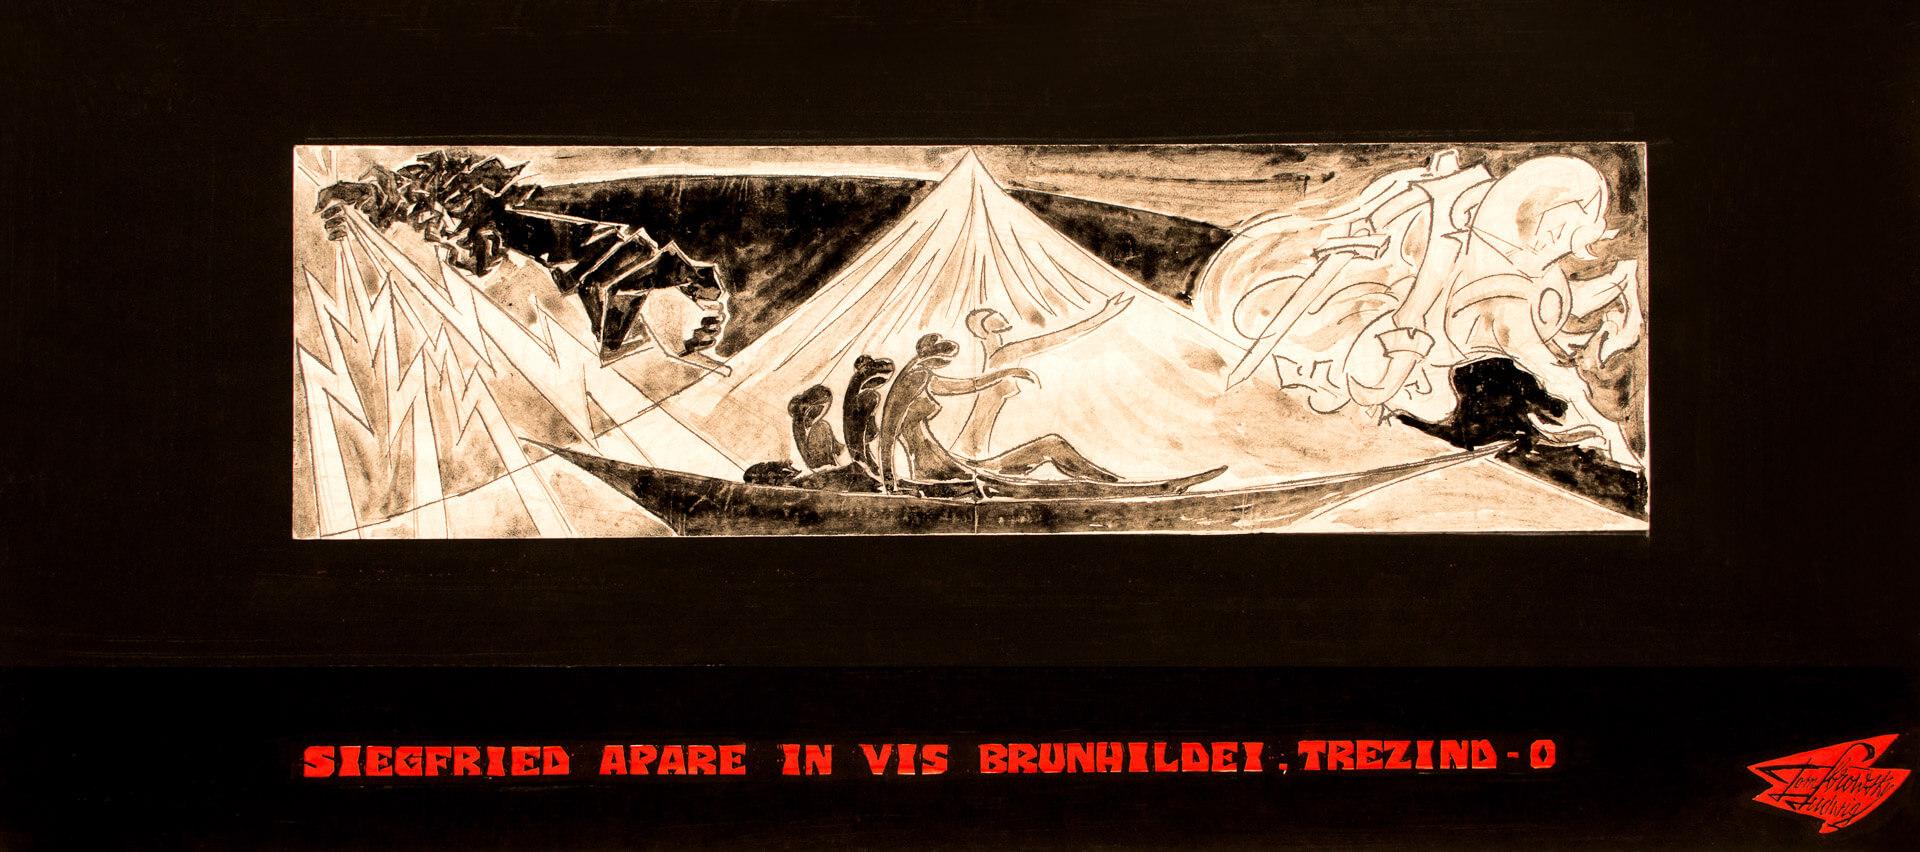 Siegfried apare în vis Brunhildei, trezind-o